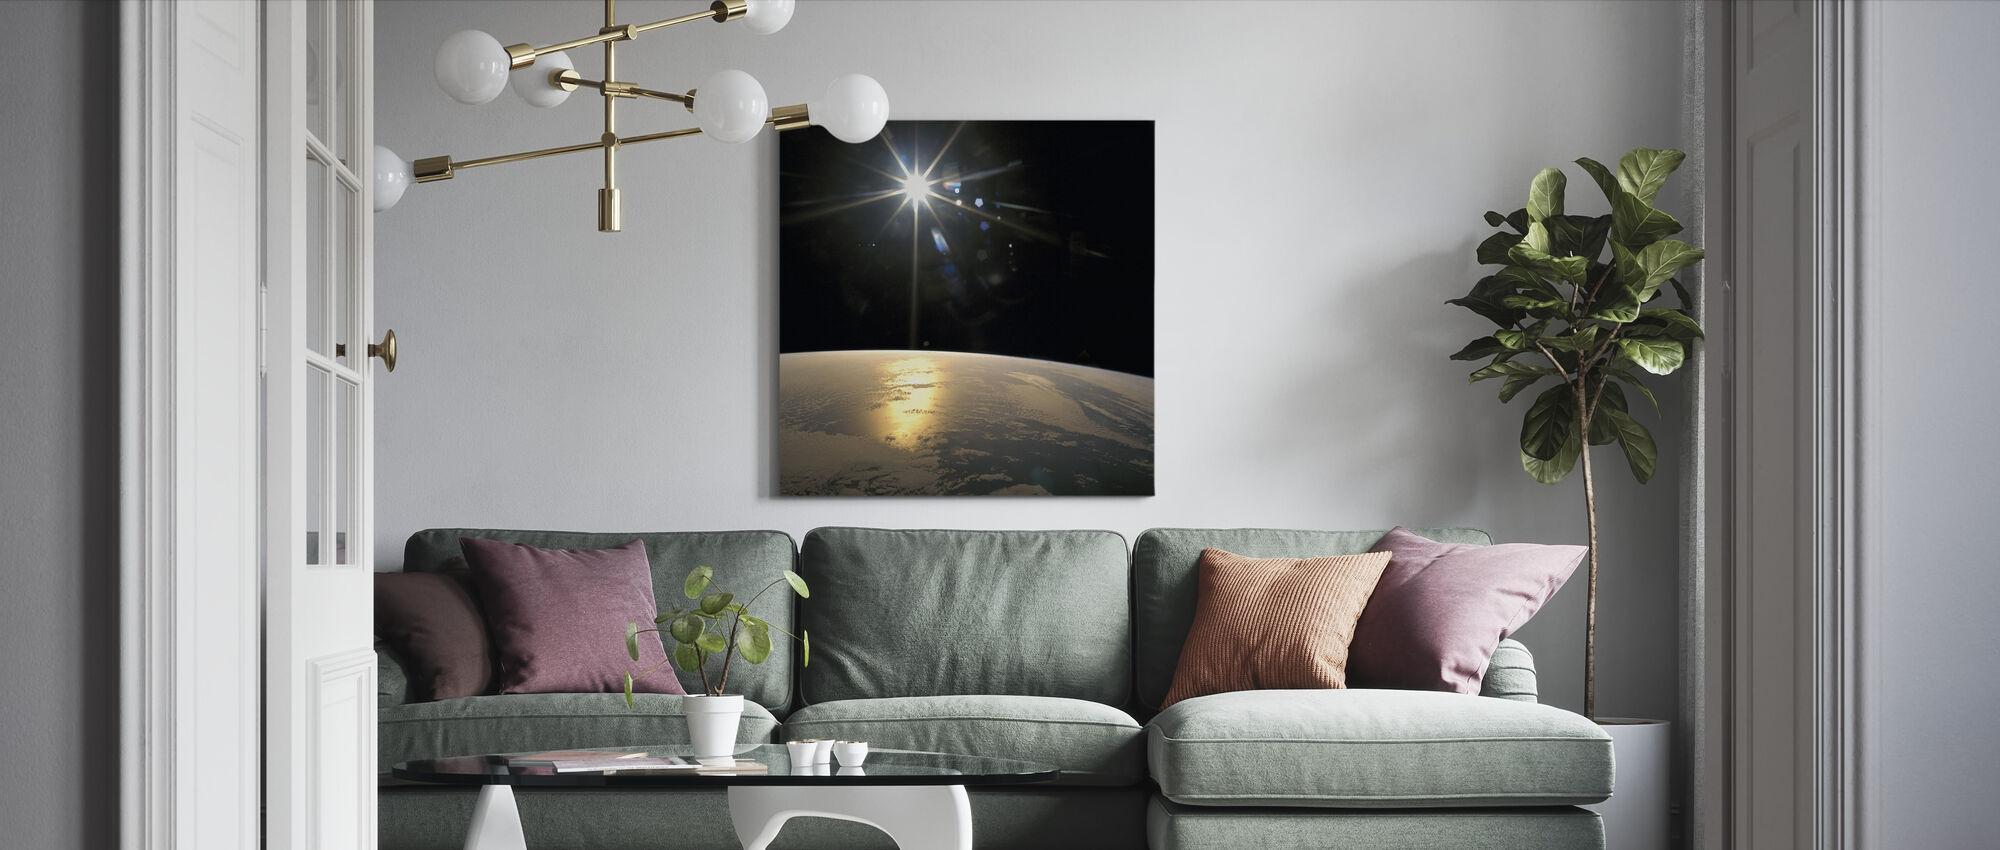 Sunrays Falling on Earth - Canvas print - Living Room